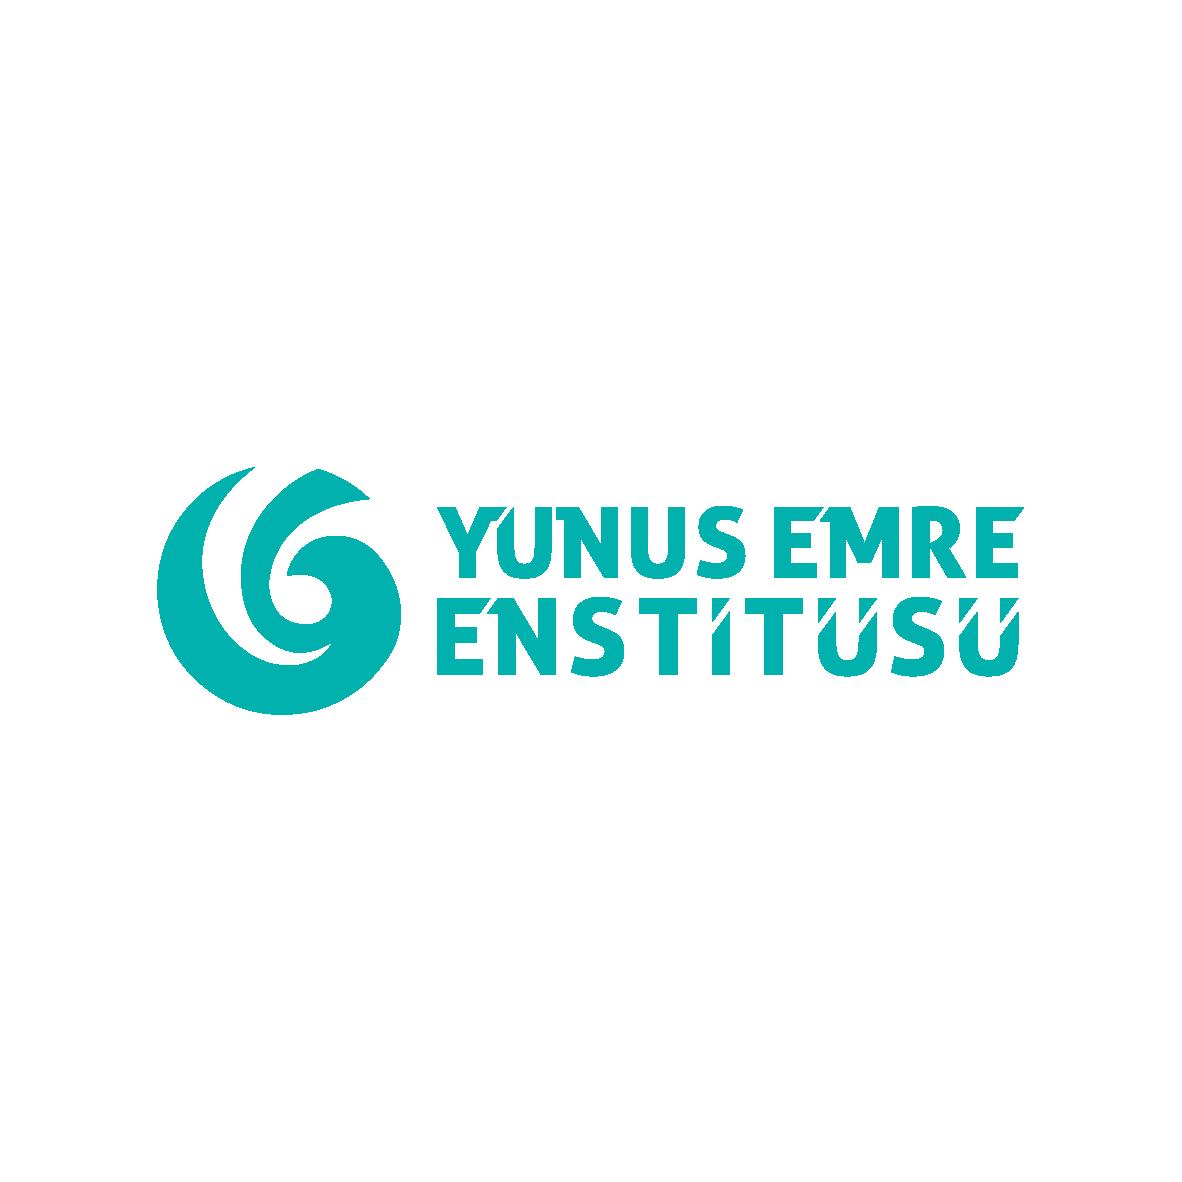 Yunus Emre Enstitüsü 2